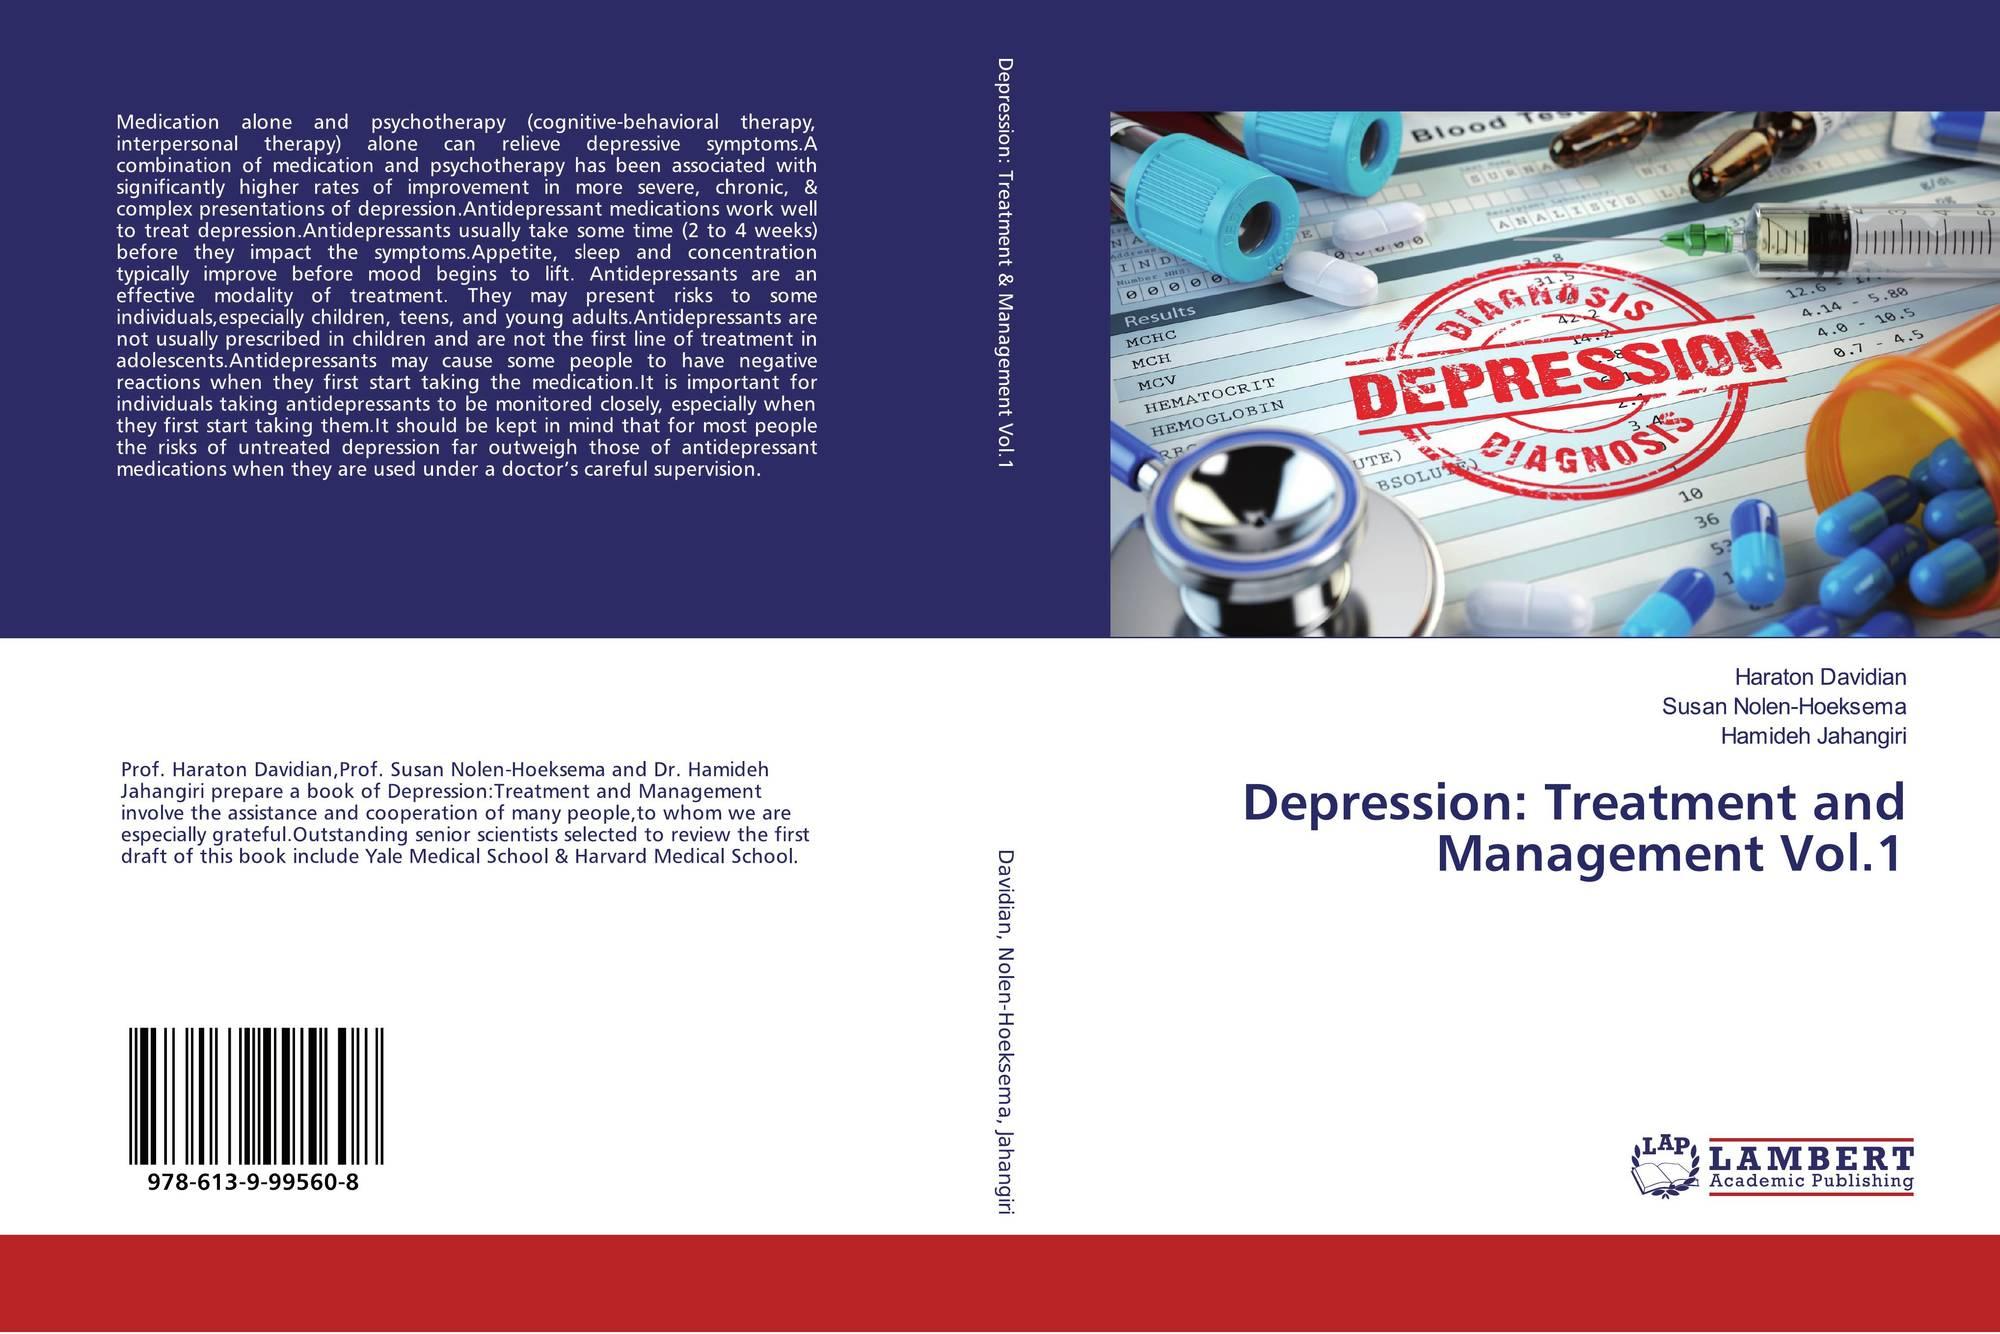 Depression: Treatment and Management Vol 1, 978-613-9-99560-8